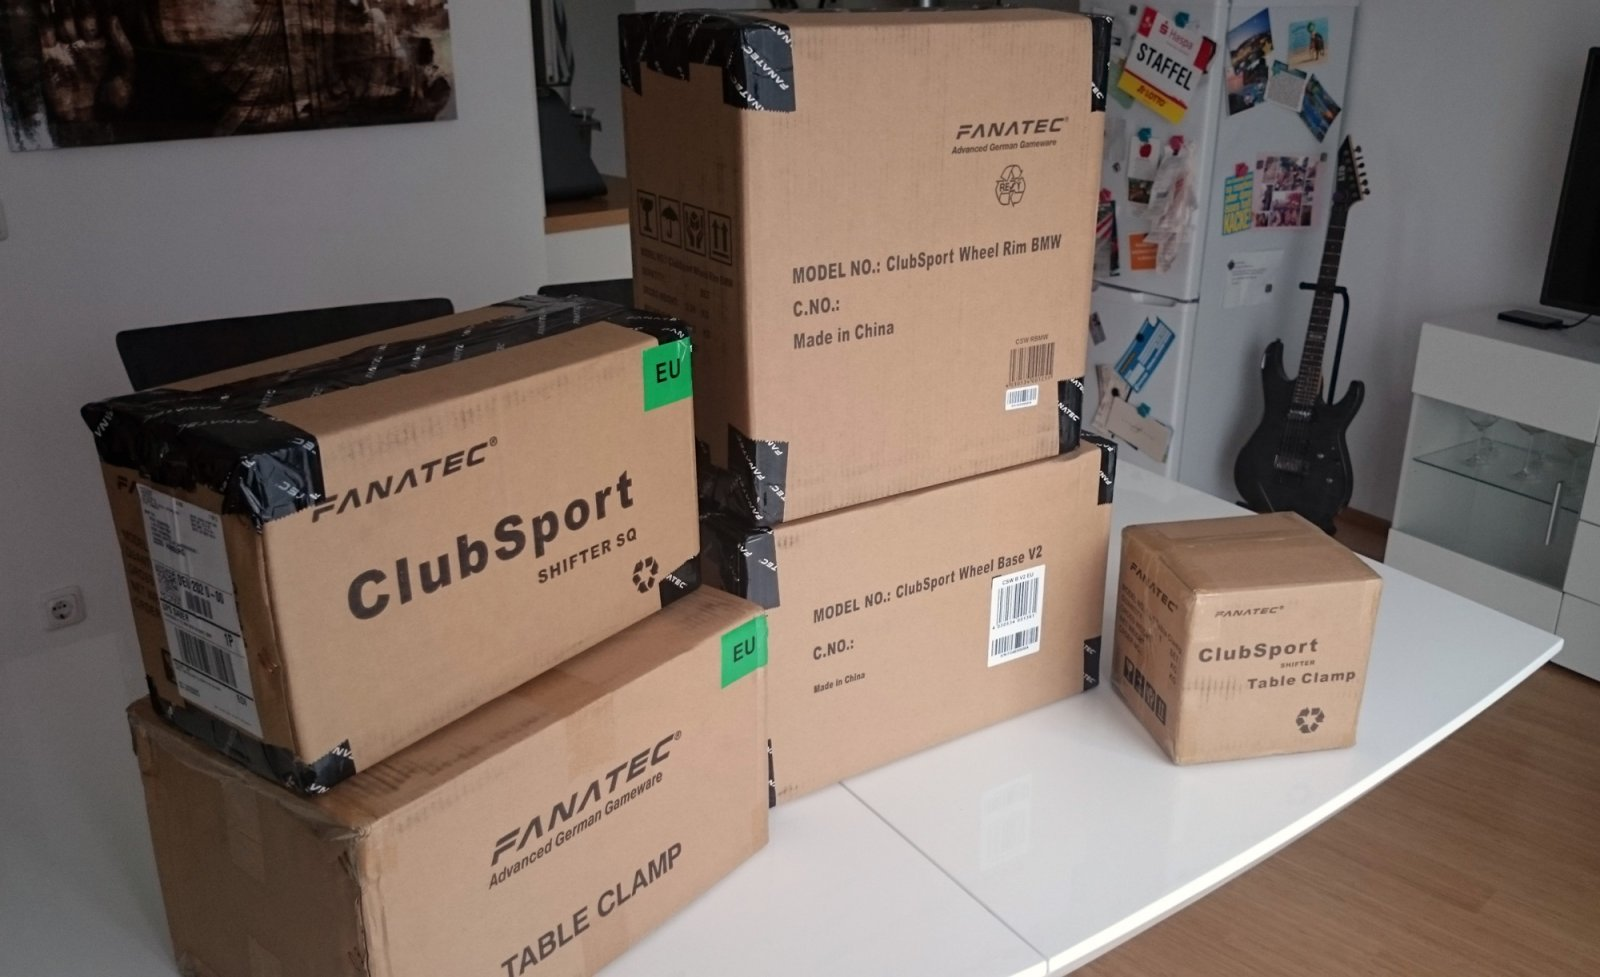 Review - Fanatec ClubSport Wheel Base V2 plus BMW M3 GT